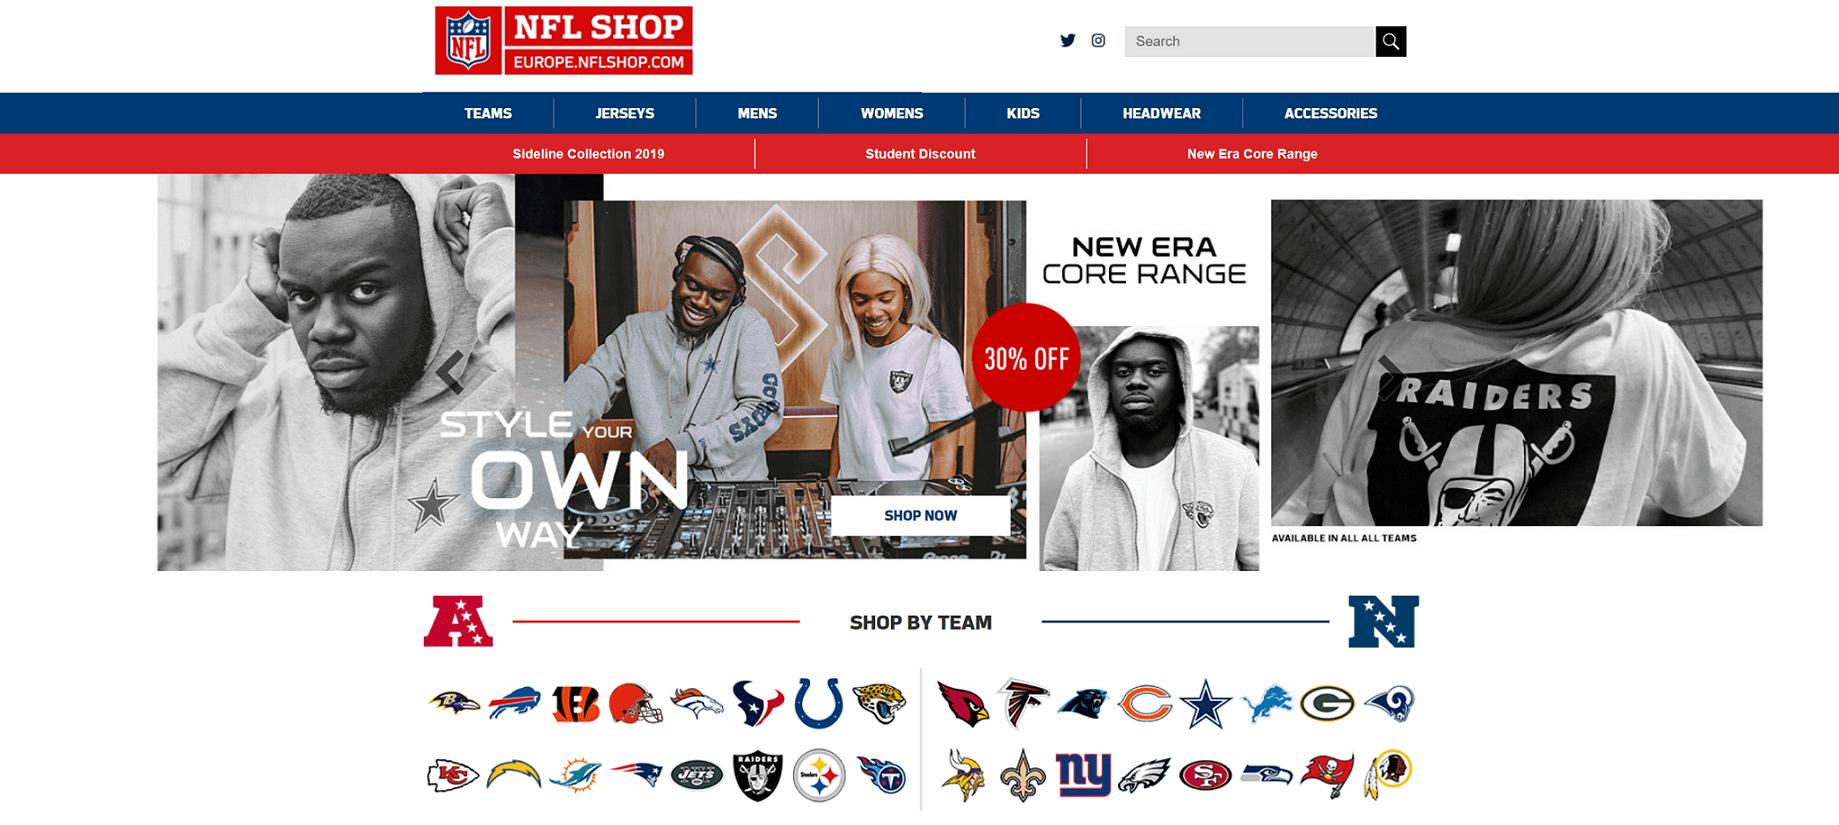 Enjoy our 10% discount code for NFLShopEurope